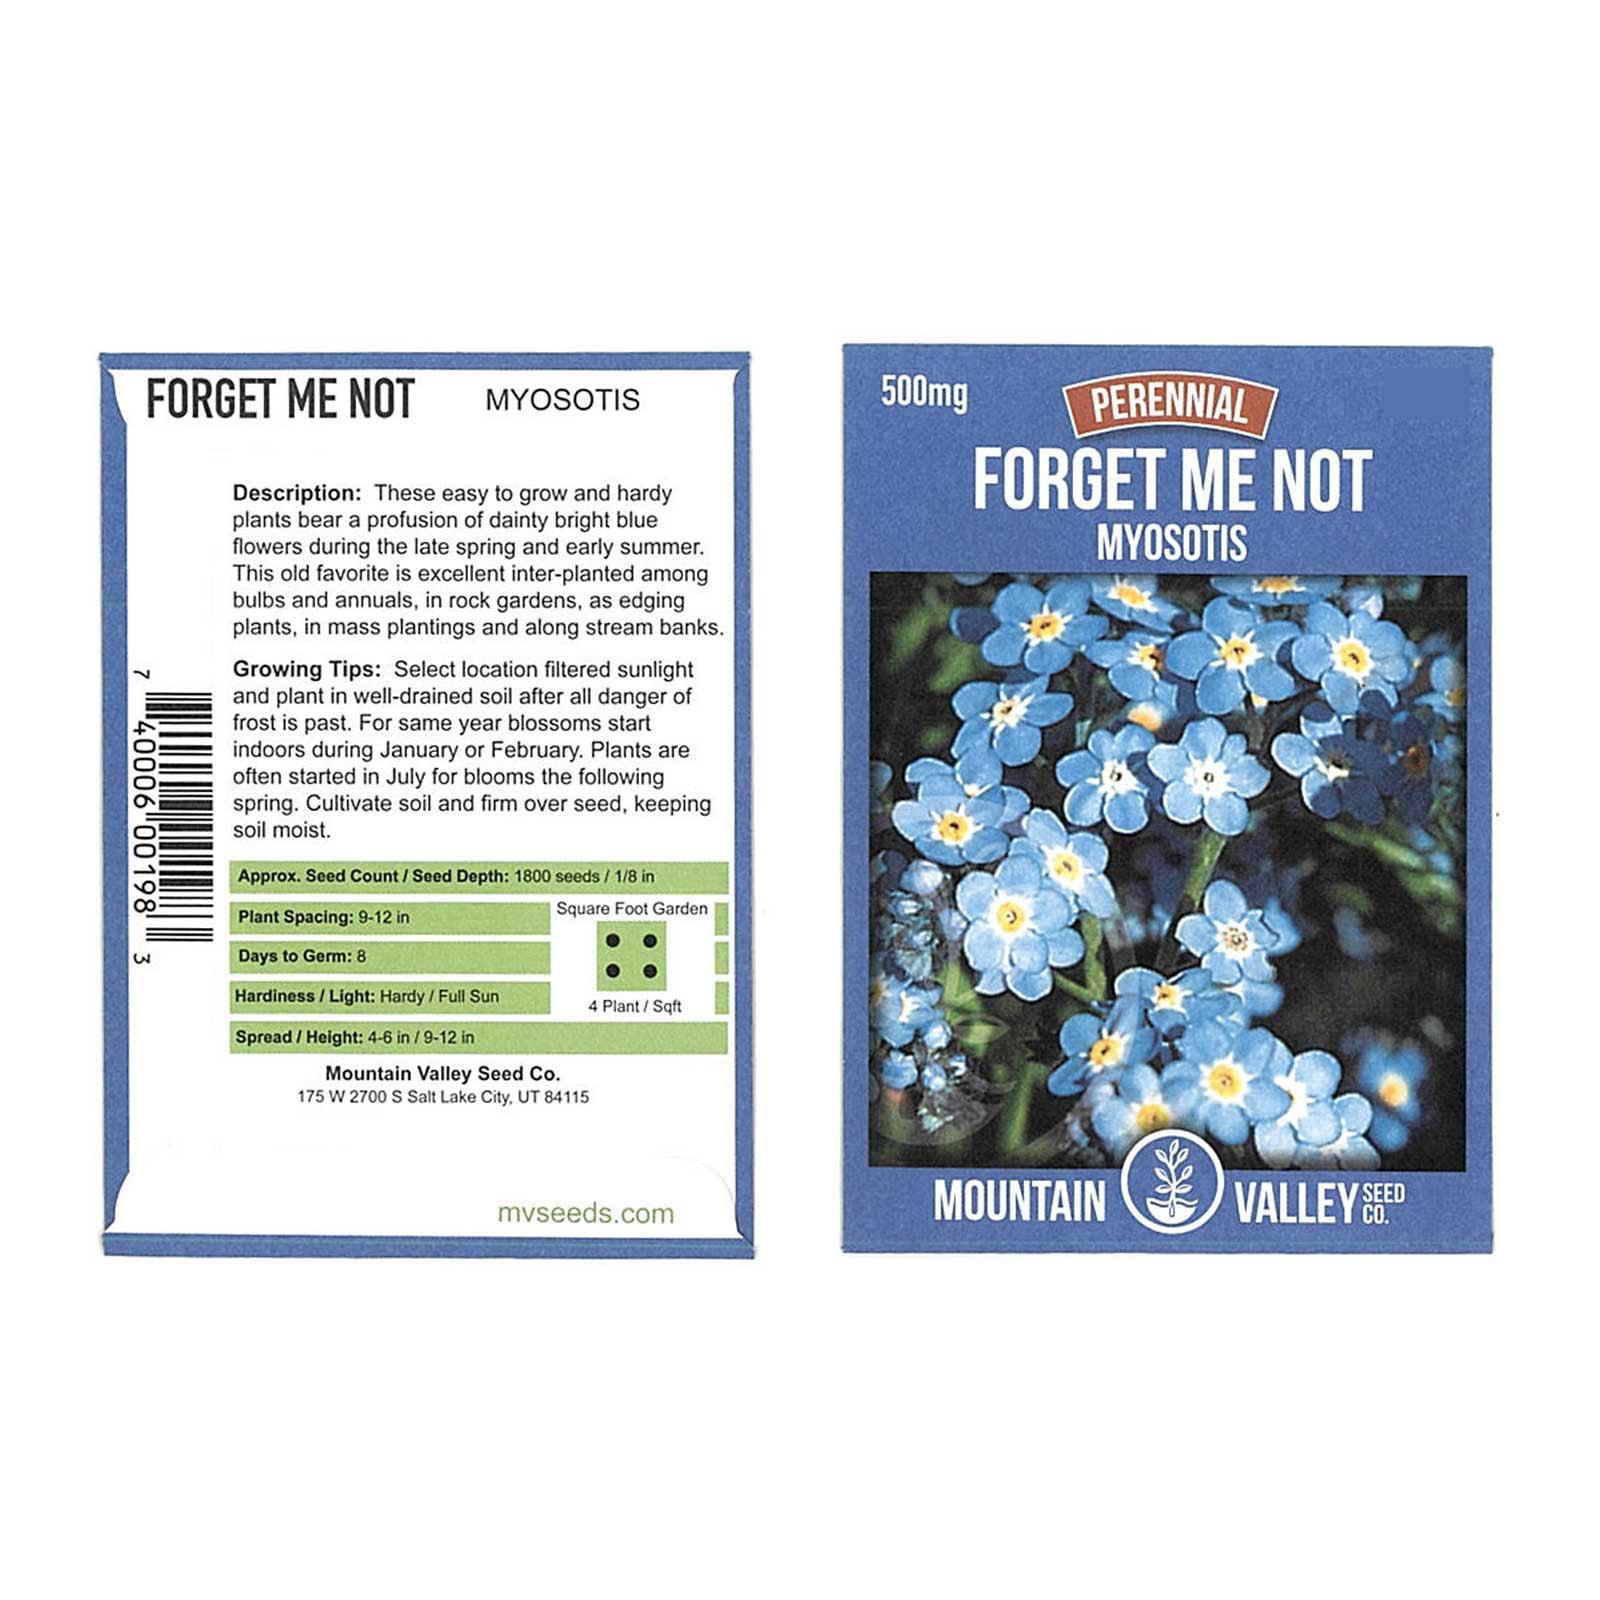 Myosotis Flower Garden Seeds - Sylvatica Forget Me Not - 500 Mg Packet - Perennial Flower Gardening Seeds - Myosotis sylvatica - Forget Me Not